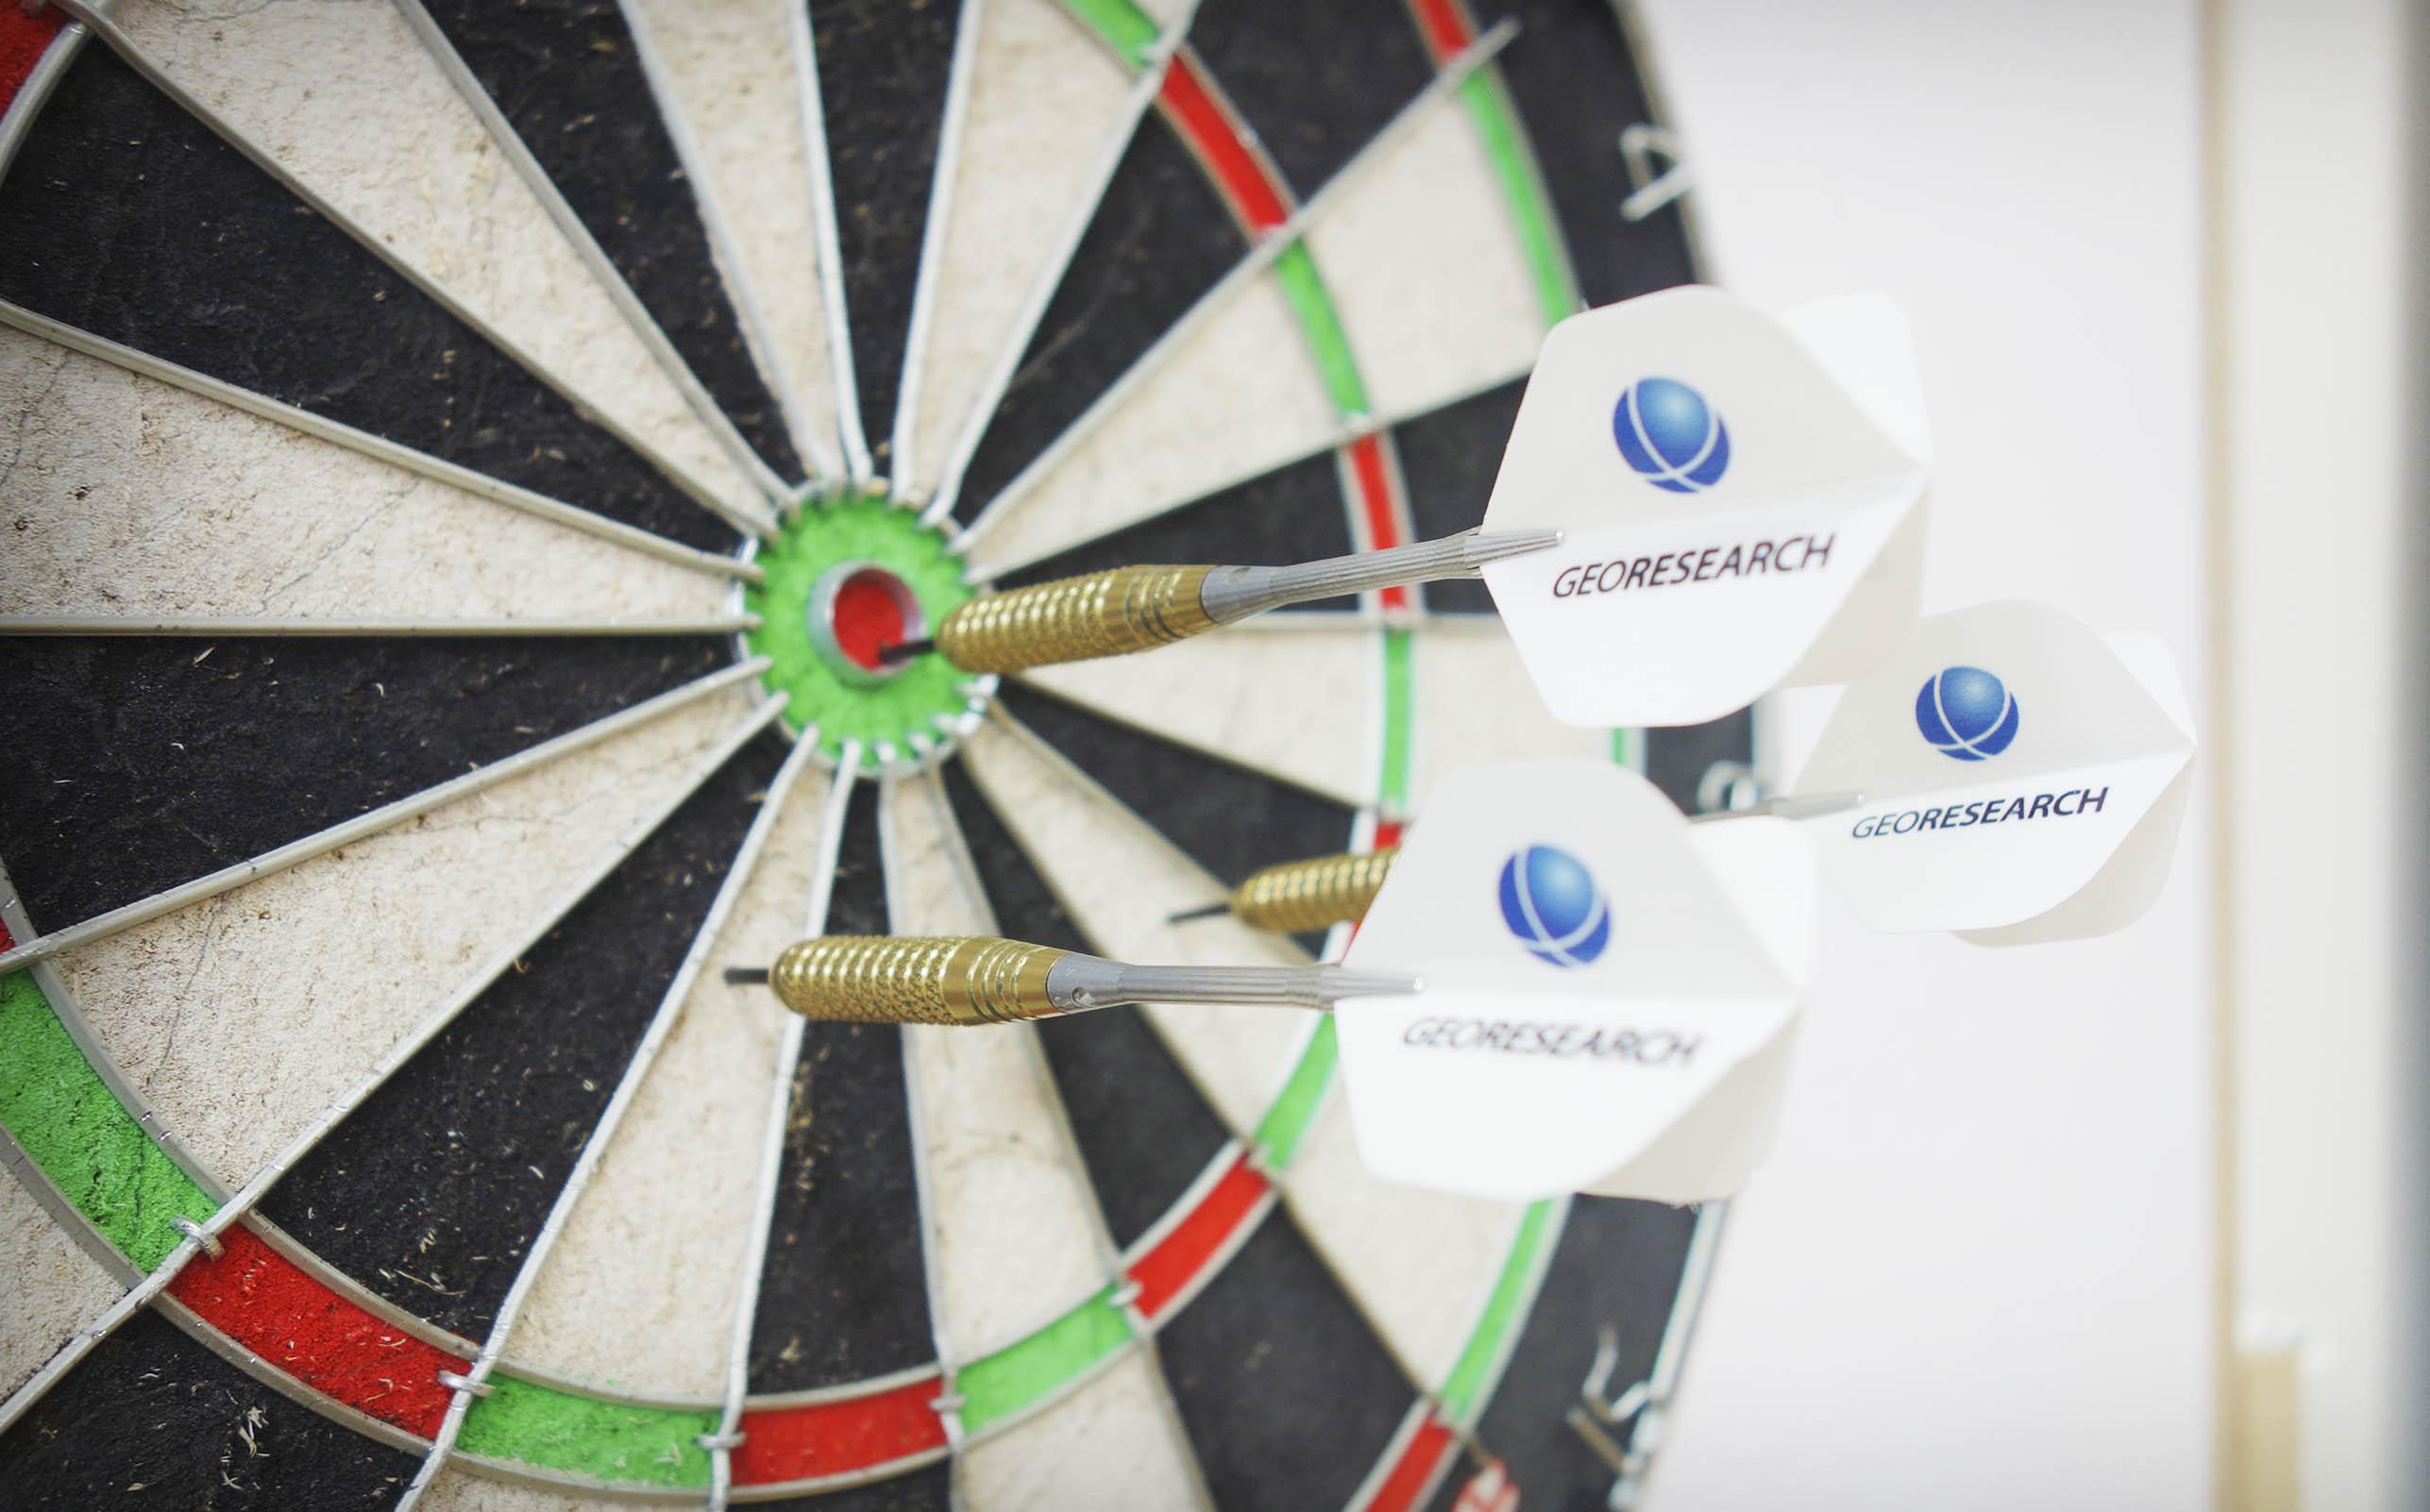 lowgeoresearch-dart